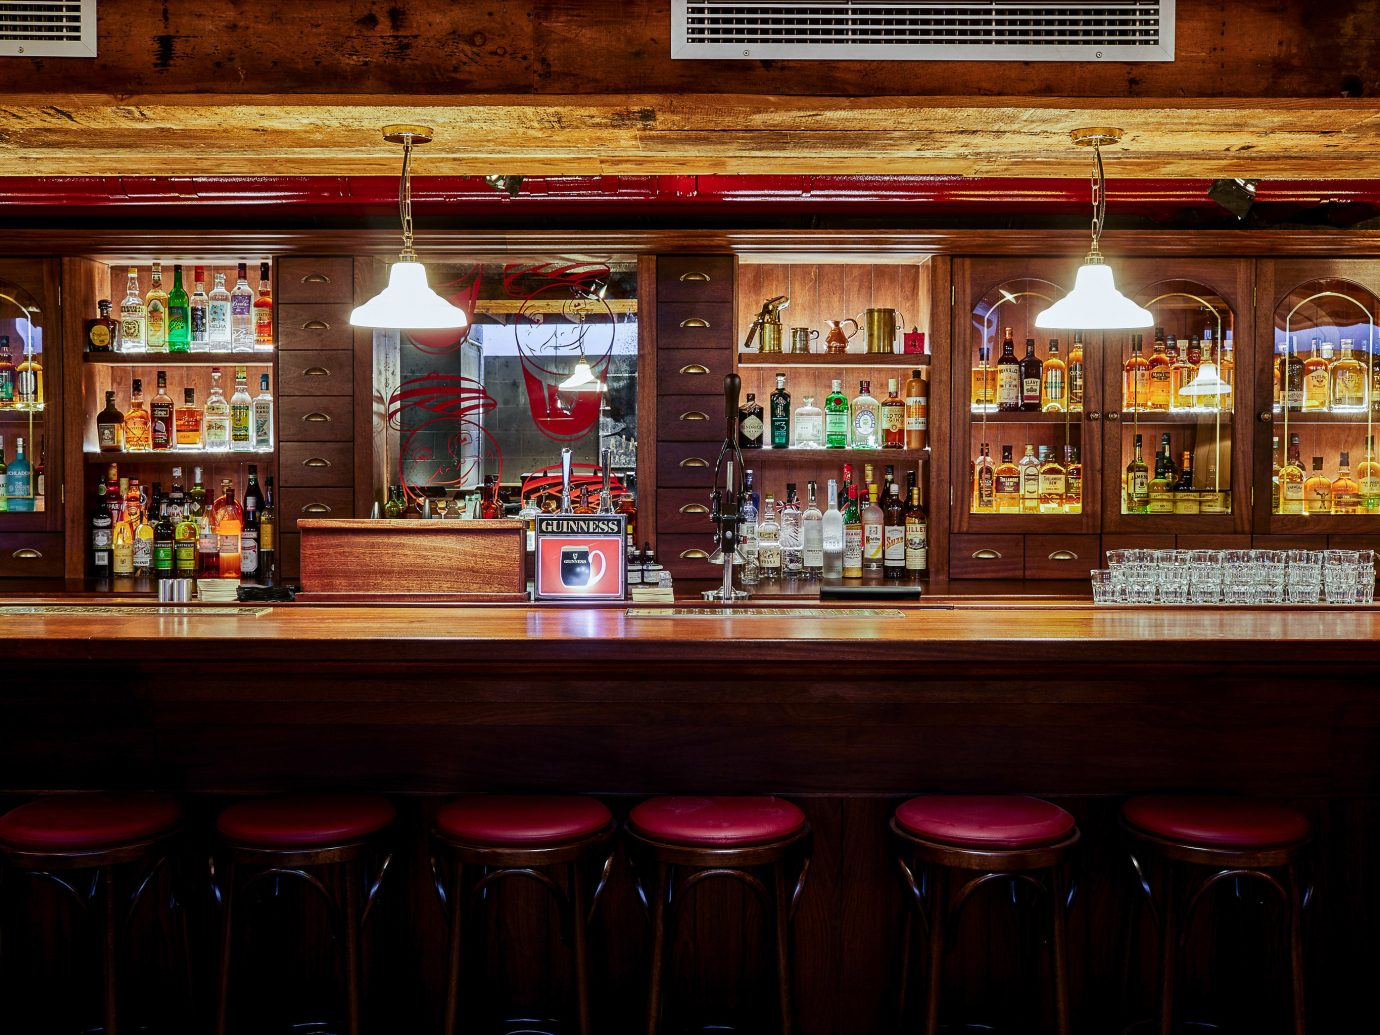 Food + Drink London shelf indoor Bar pub liquor store tavern store restaurant interior design several